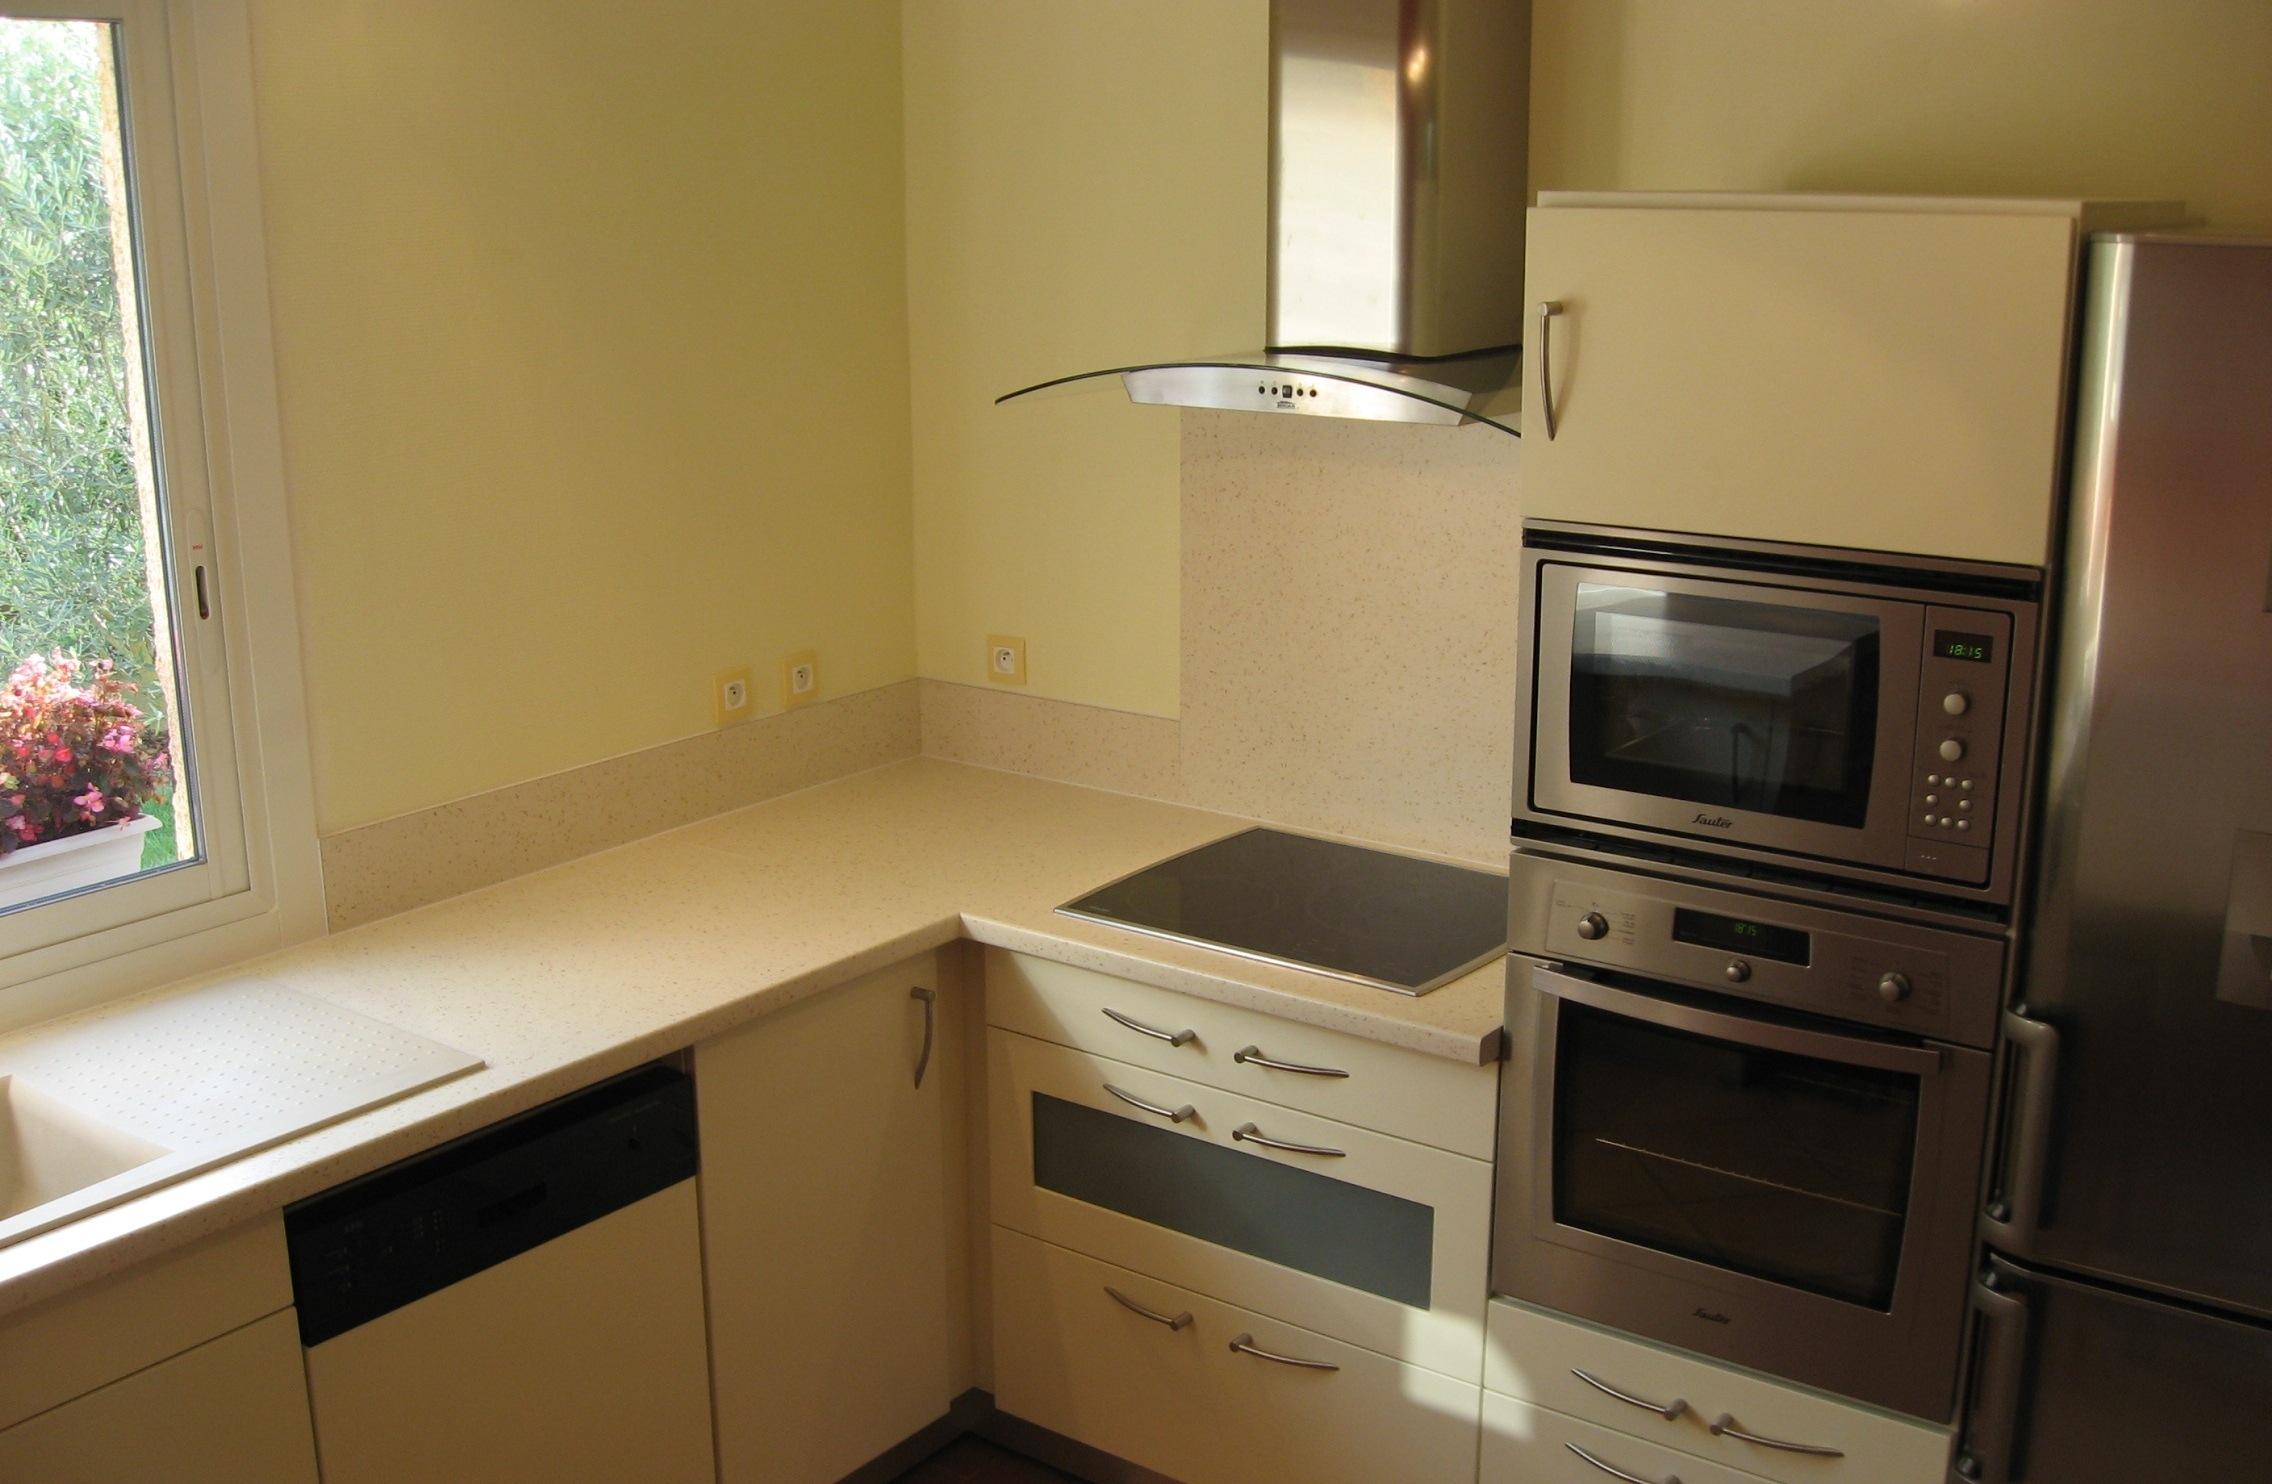 fabrication cuisine sur mesure toulouse st phane germain eb niste. Black Bedroom Furniture Sets. Home Design Ideas